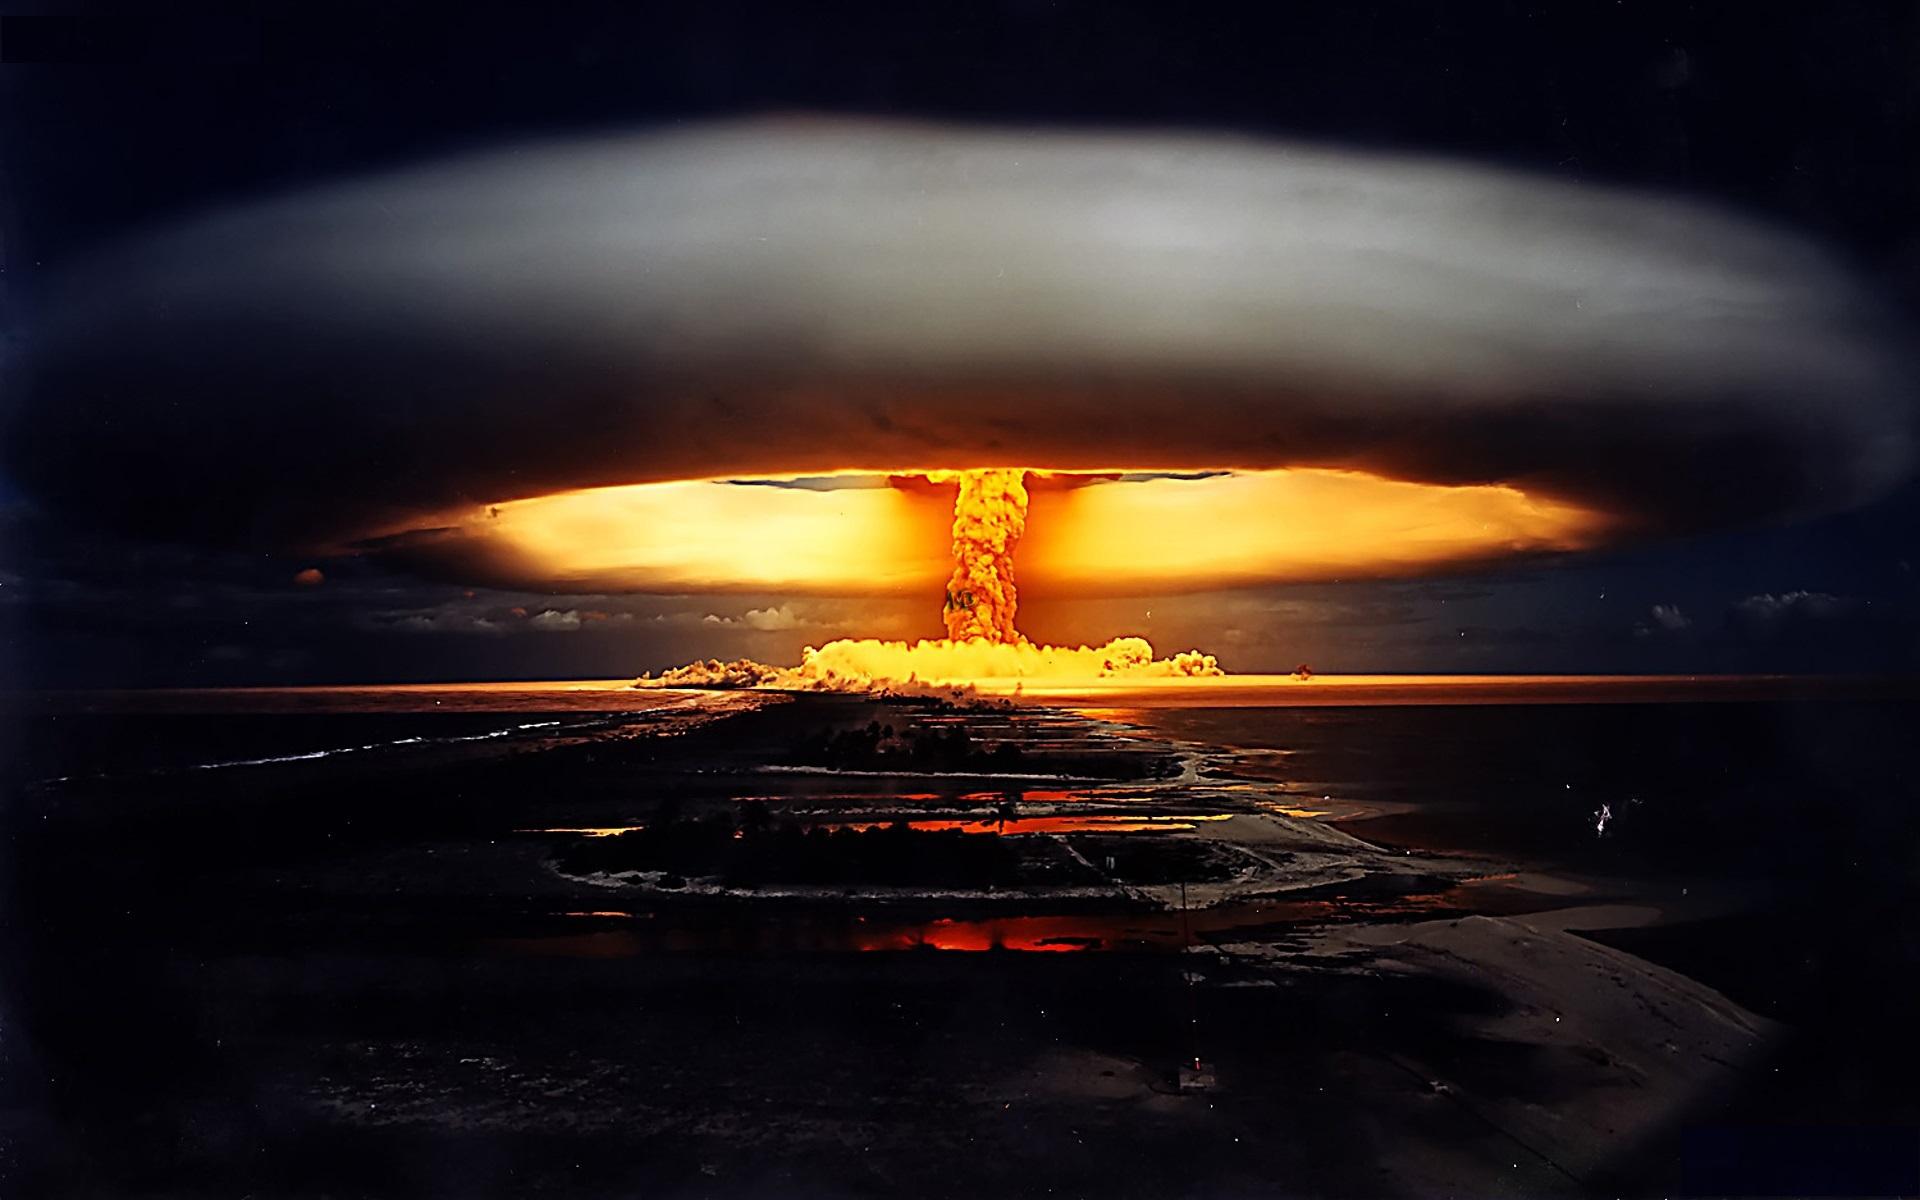 the big bang دانلود کتاب انفجار ذرات و تسلیحات ترموباریک